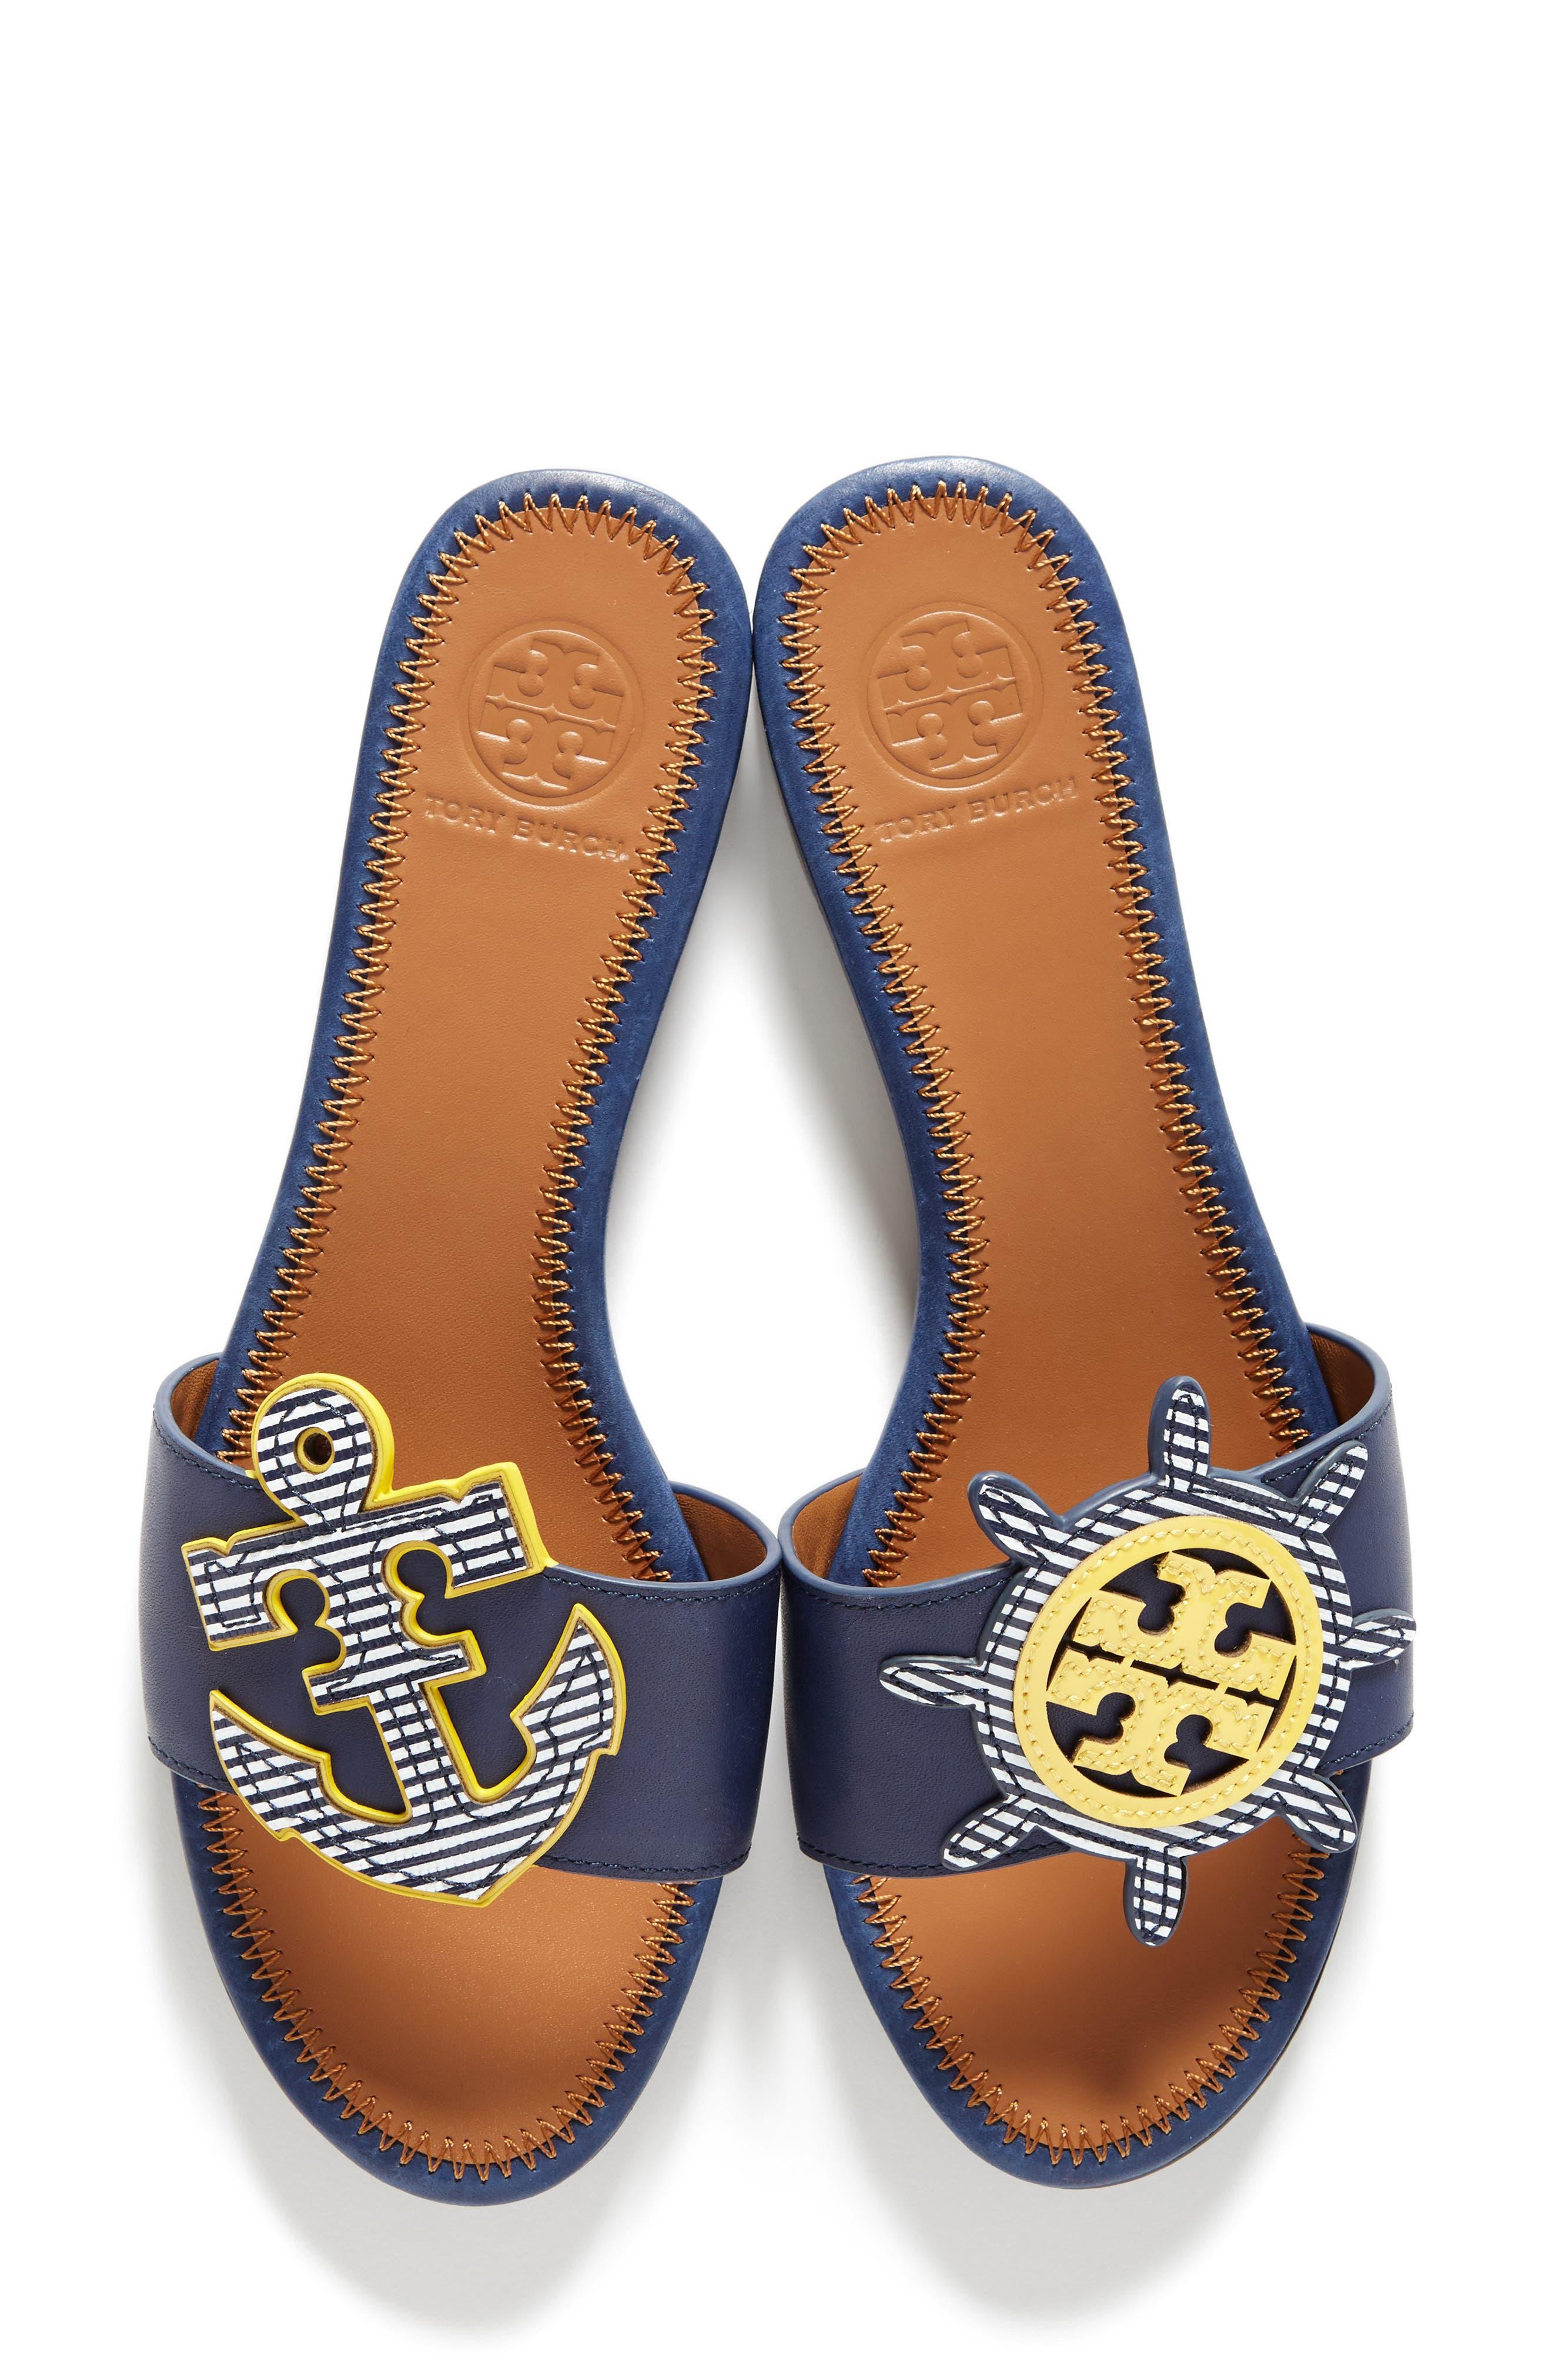 Alternate Image 1 Selected - Tory Burch Maritime Slide Sandal (Women)